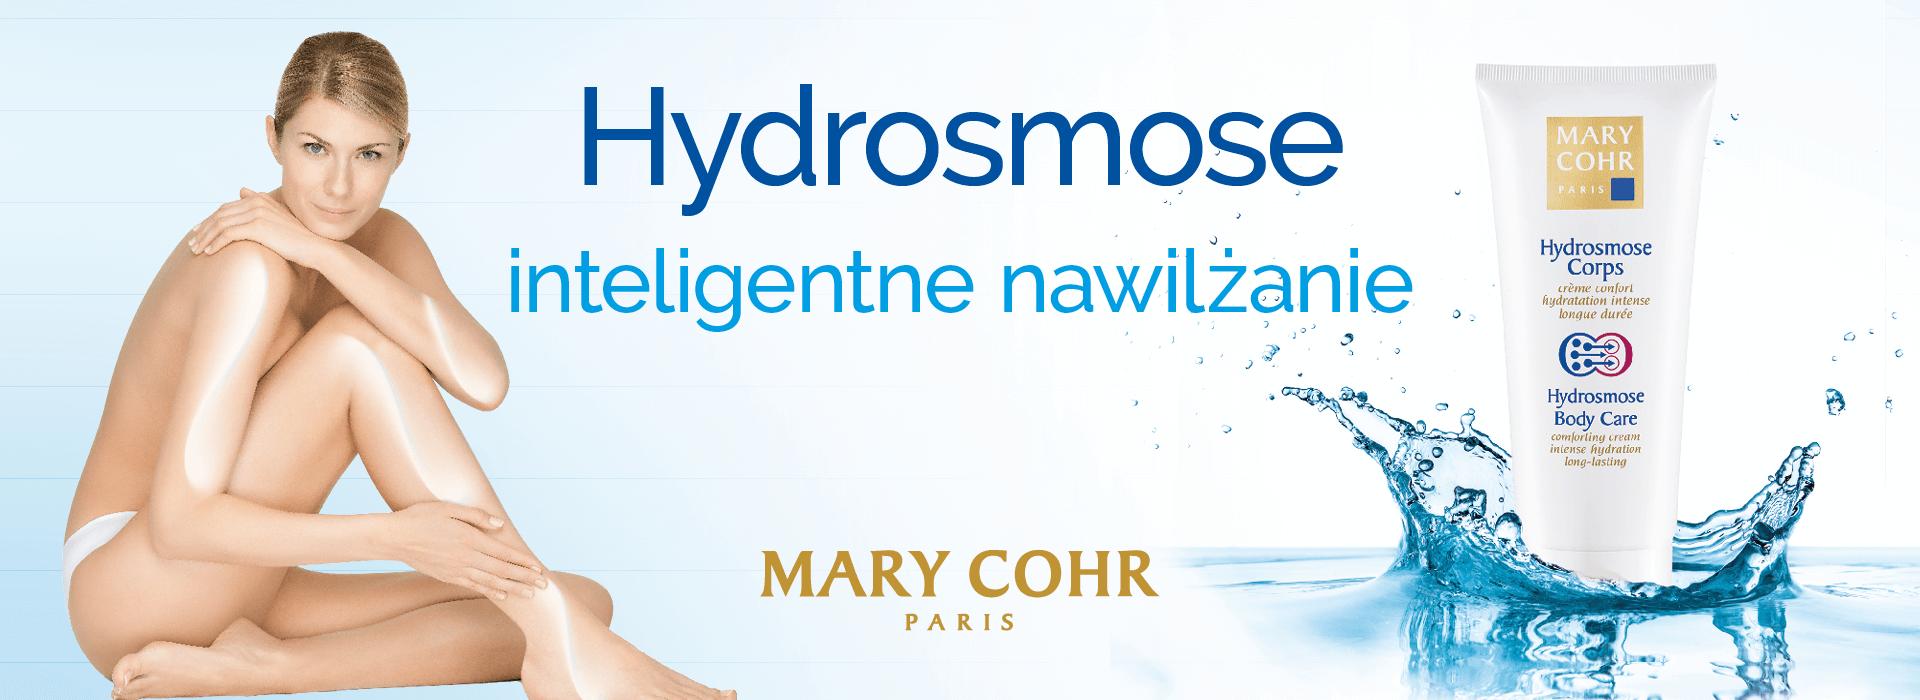 hydrosmose